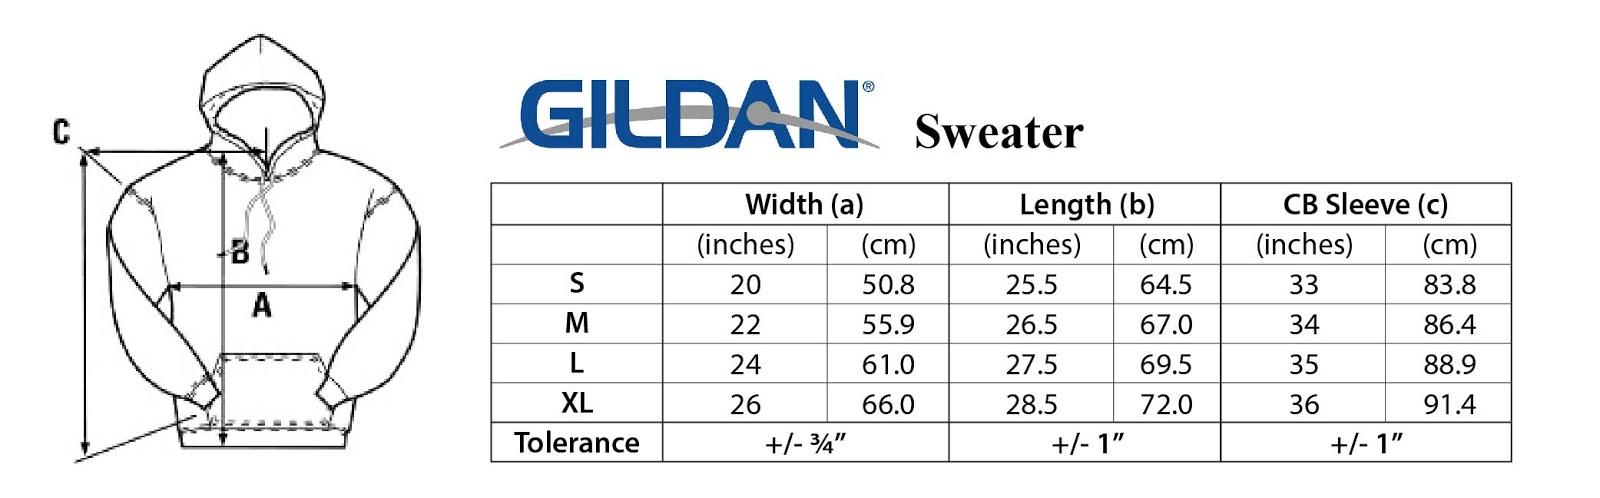 Pin Gildan Size Chart On Pinterest